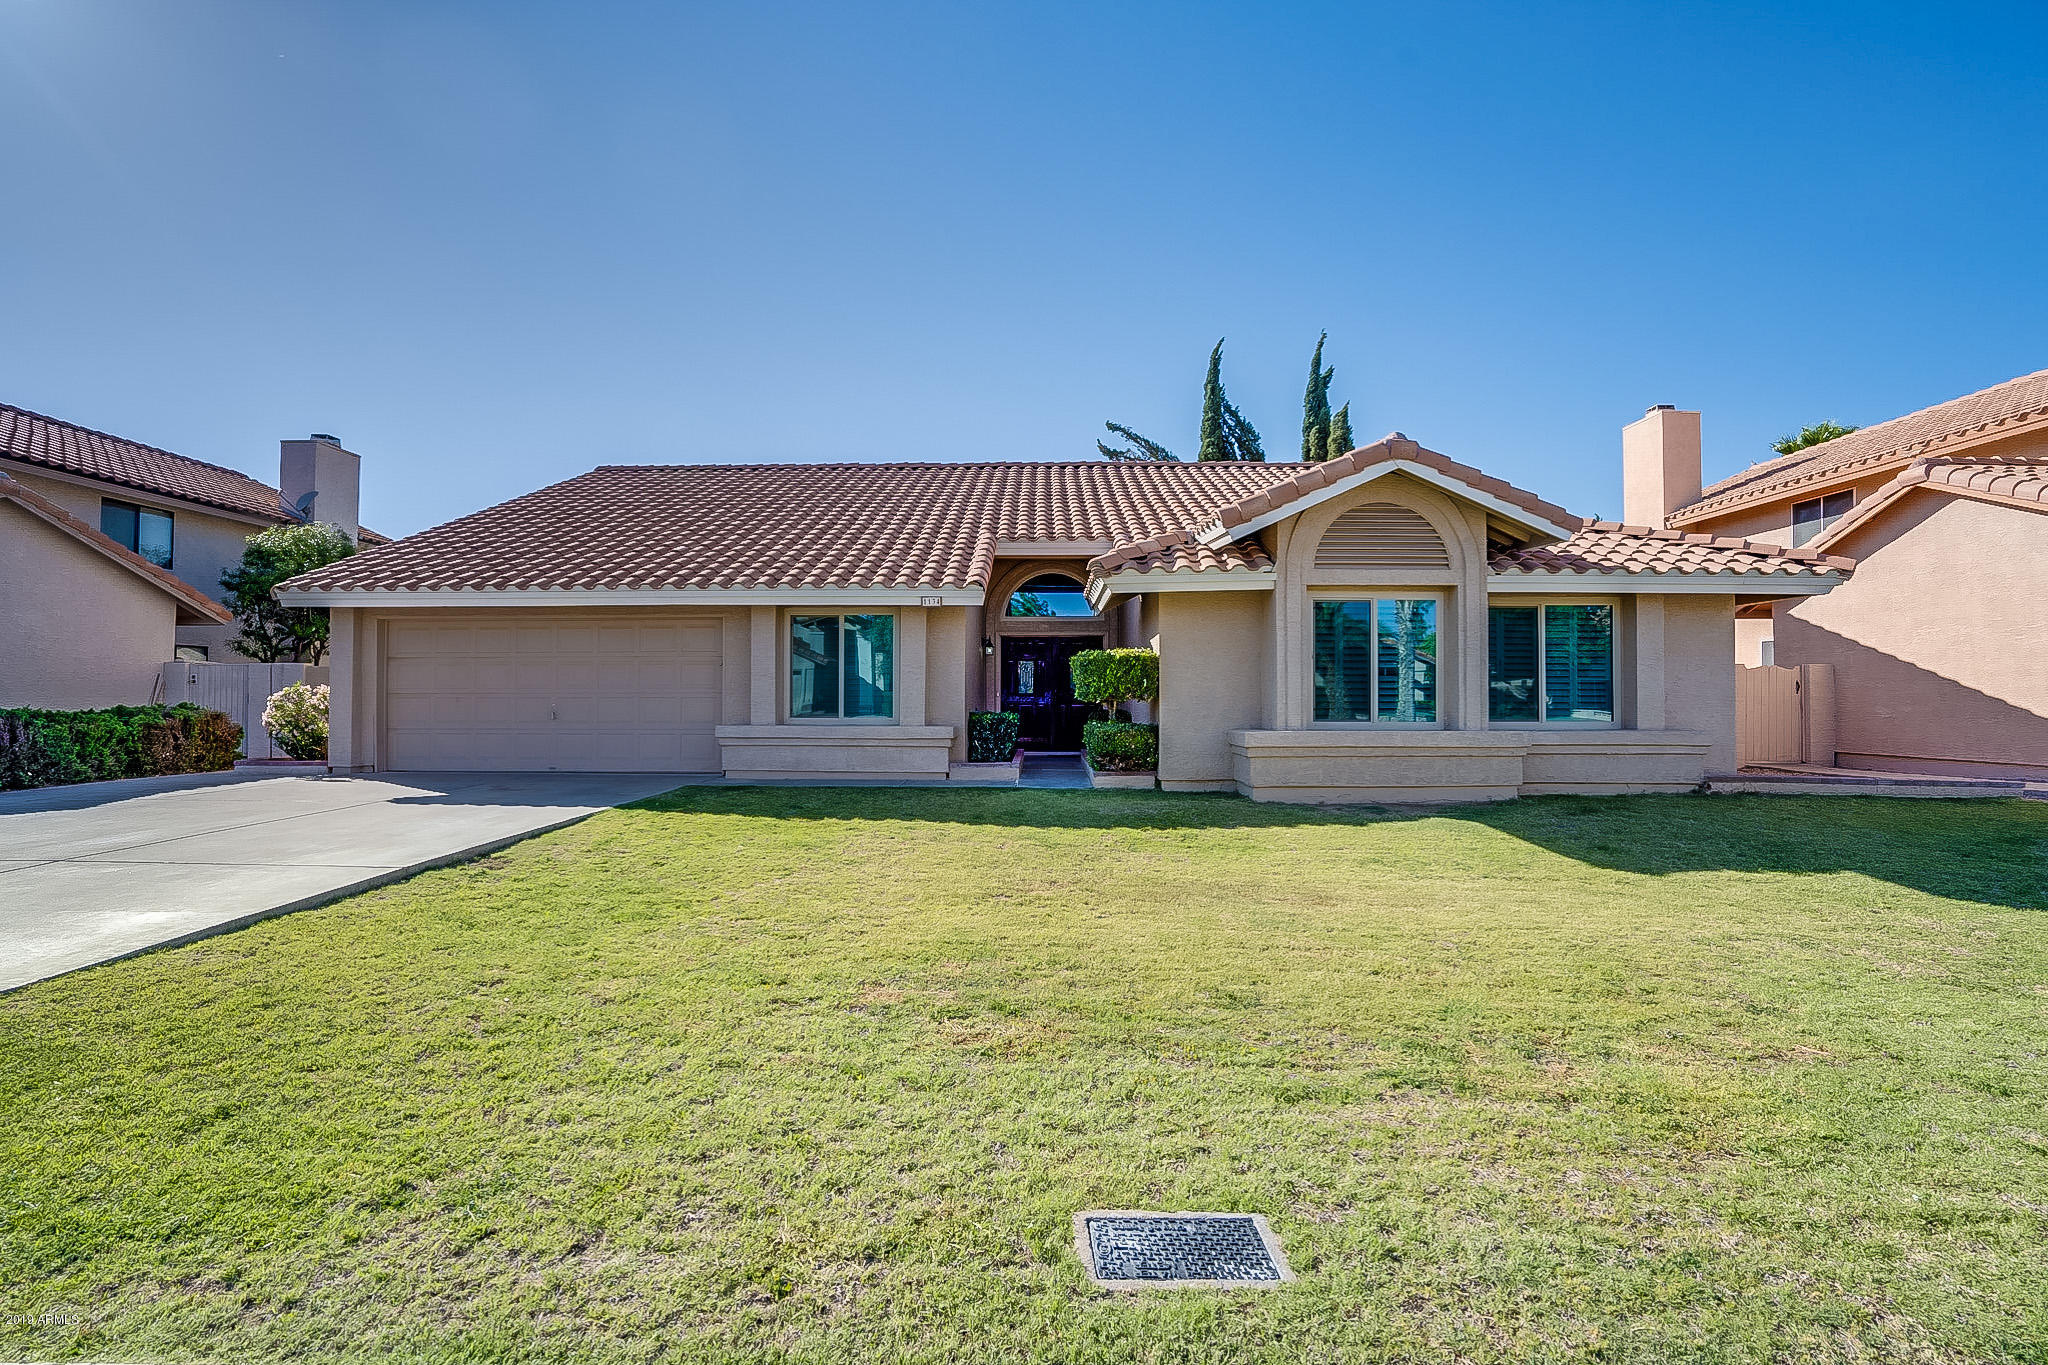 Photo of 1134 E TODD Drive, Tempe, AZ 85283